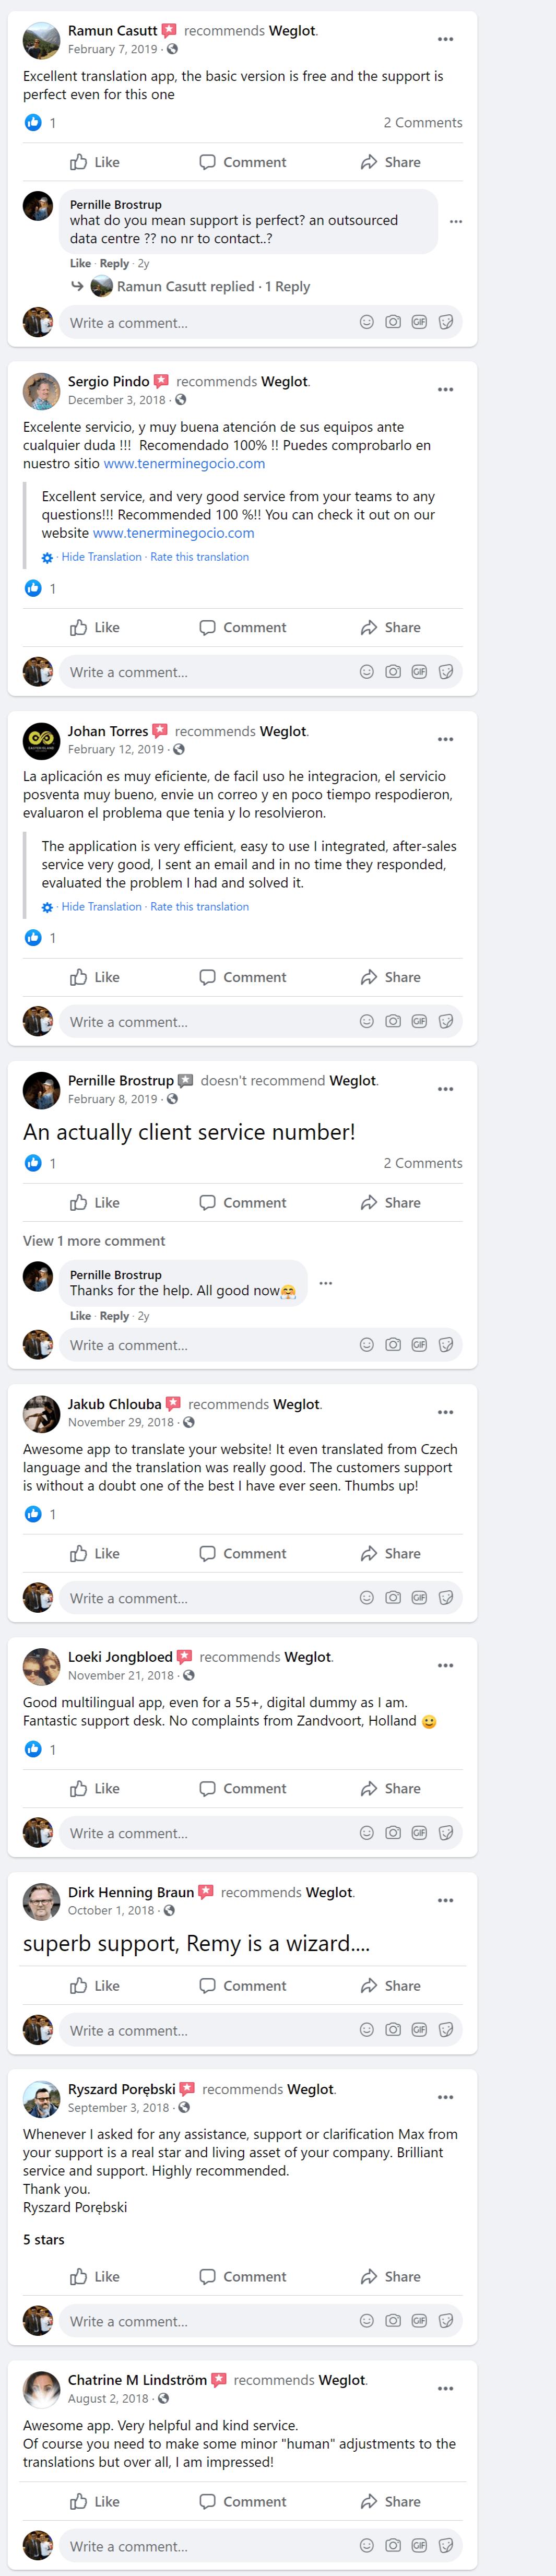 weglot customer support reviews